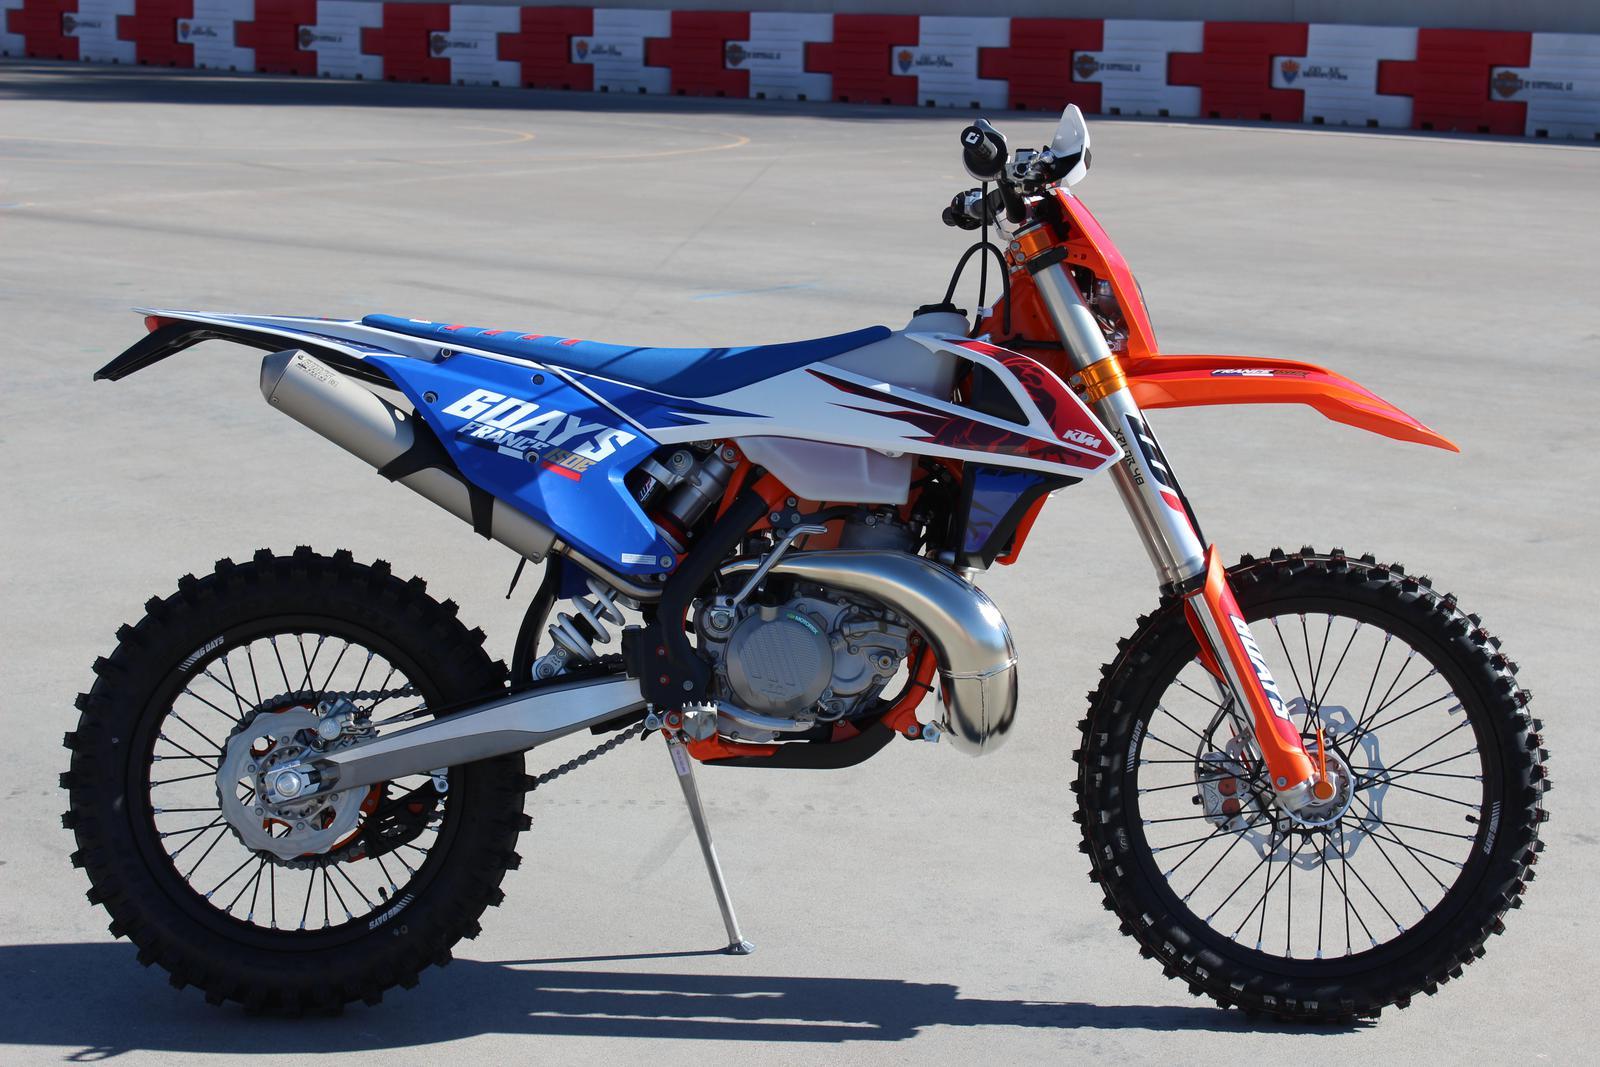 Superb 2018 Ktm 300 Xc W Six Days Go Az Motorcycles In Scottsdale Spiritservingveterans Wood Chair Design Ideas Spiritservingveteransorg